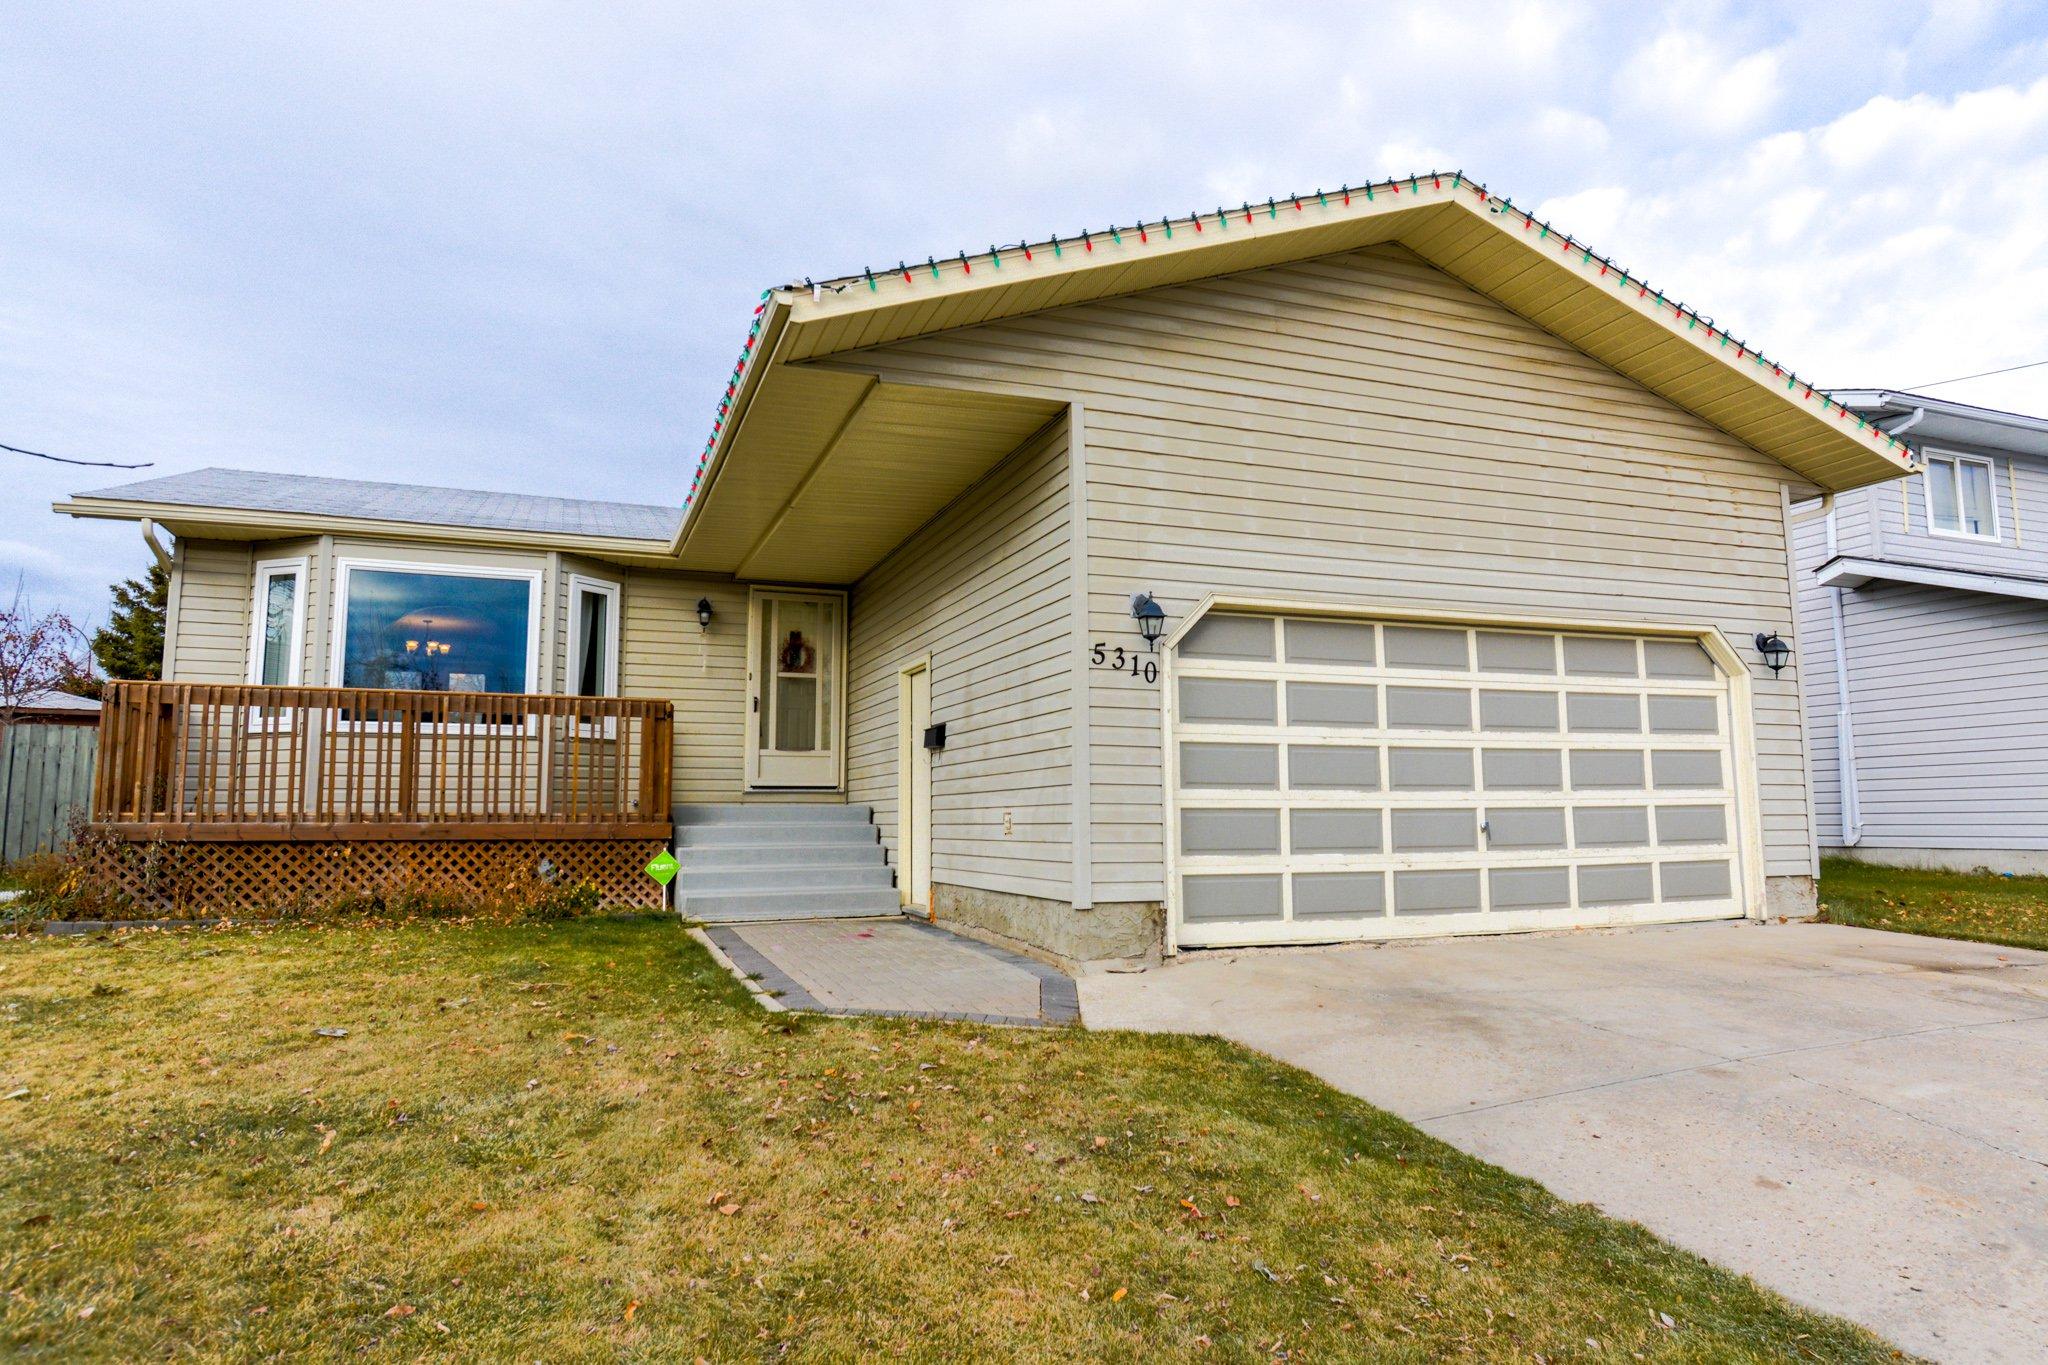 Main Photo: 5310 38 Street: Cold Lake House for sale : MLS®# E4219496